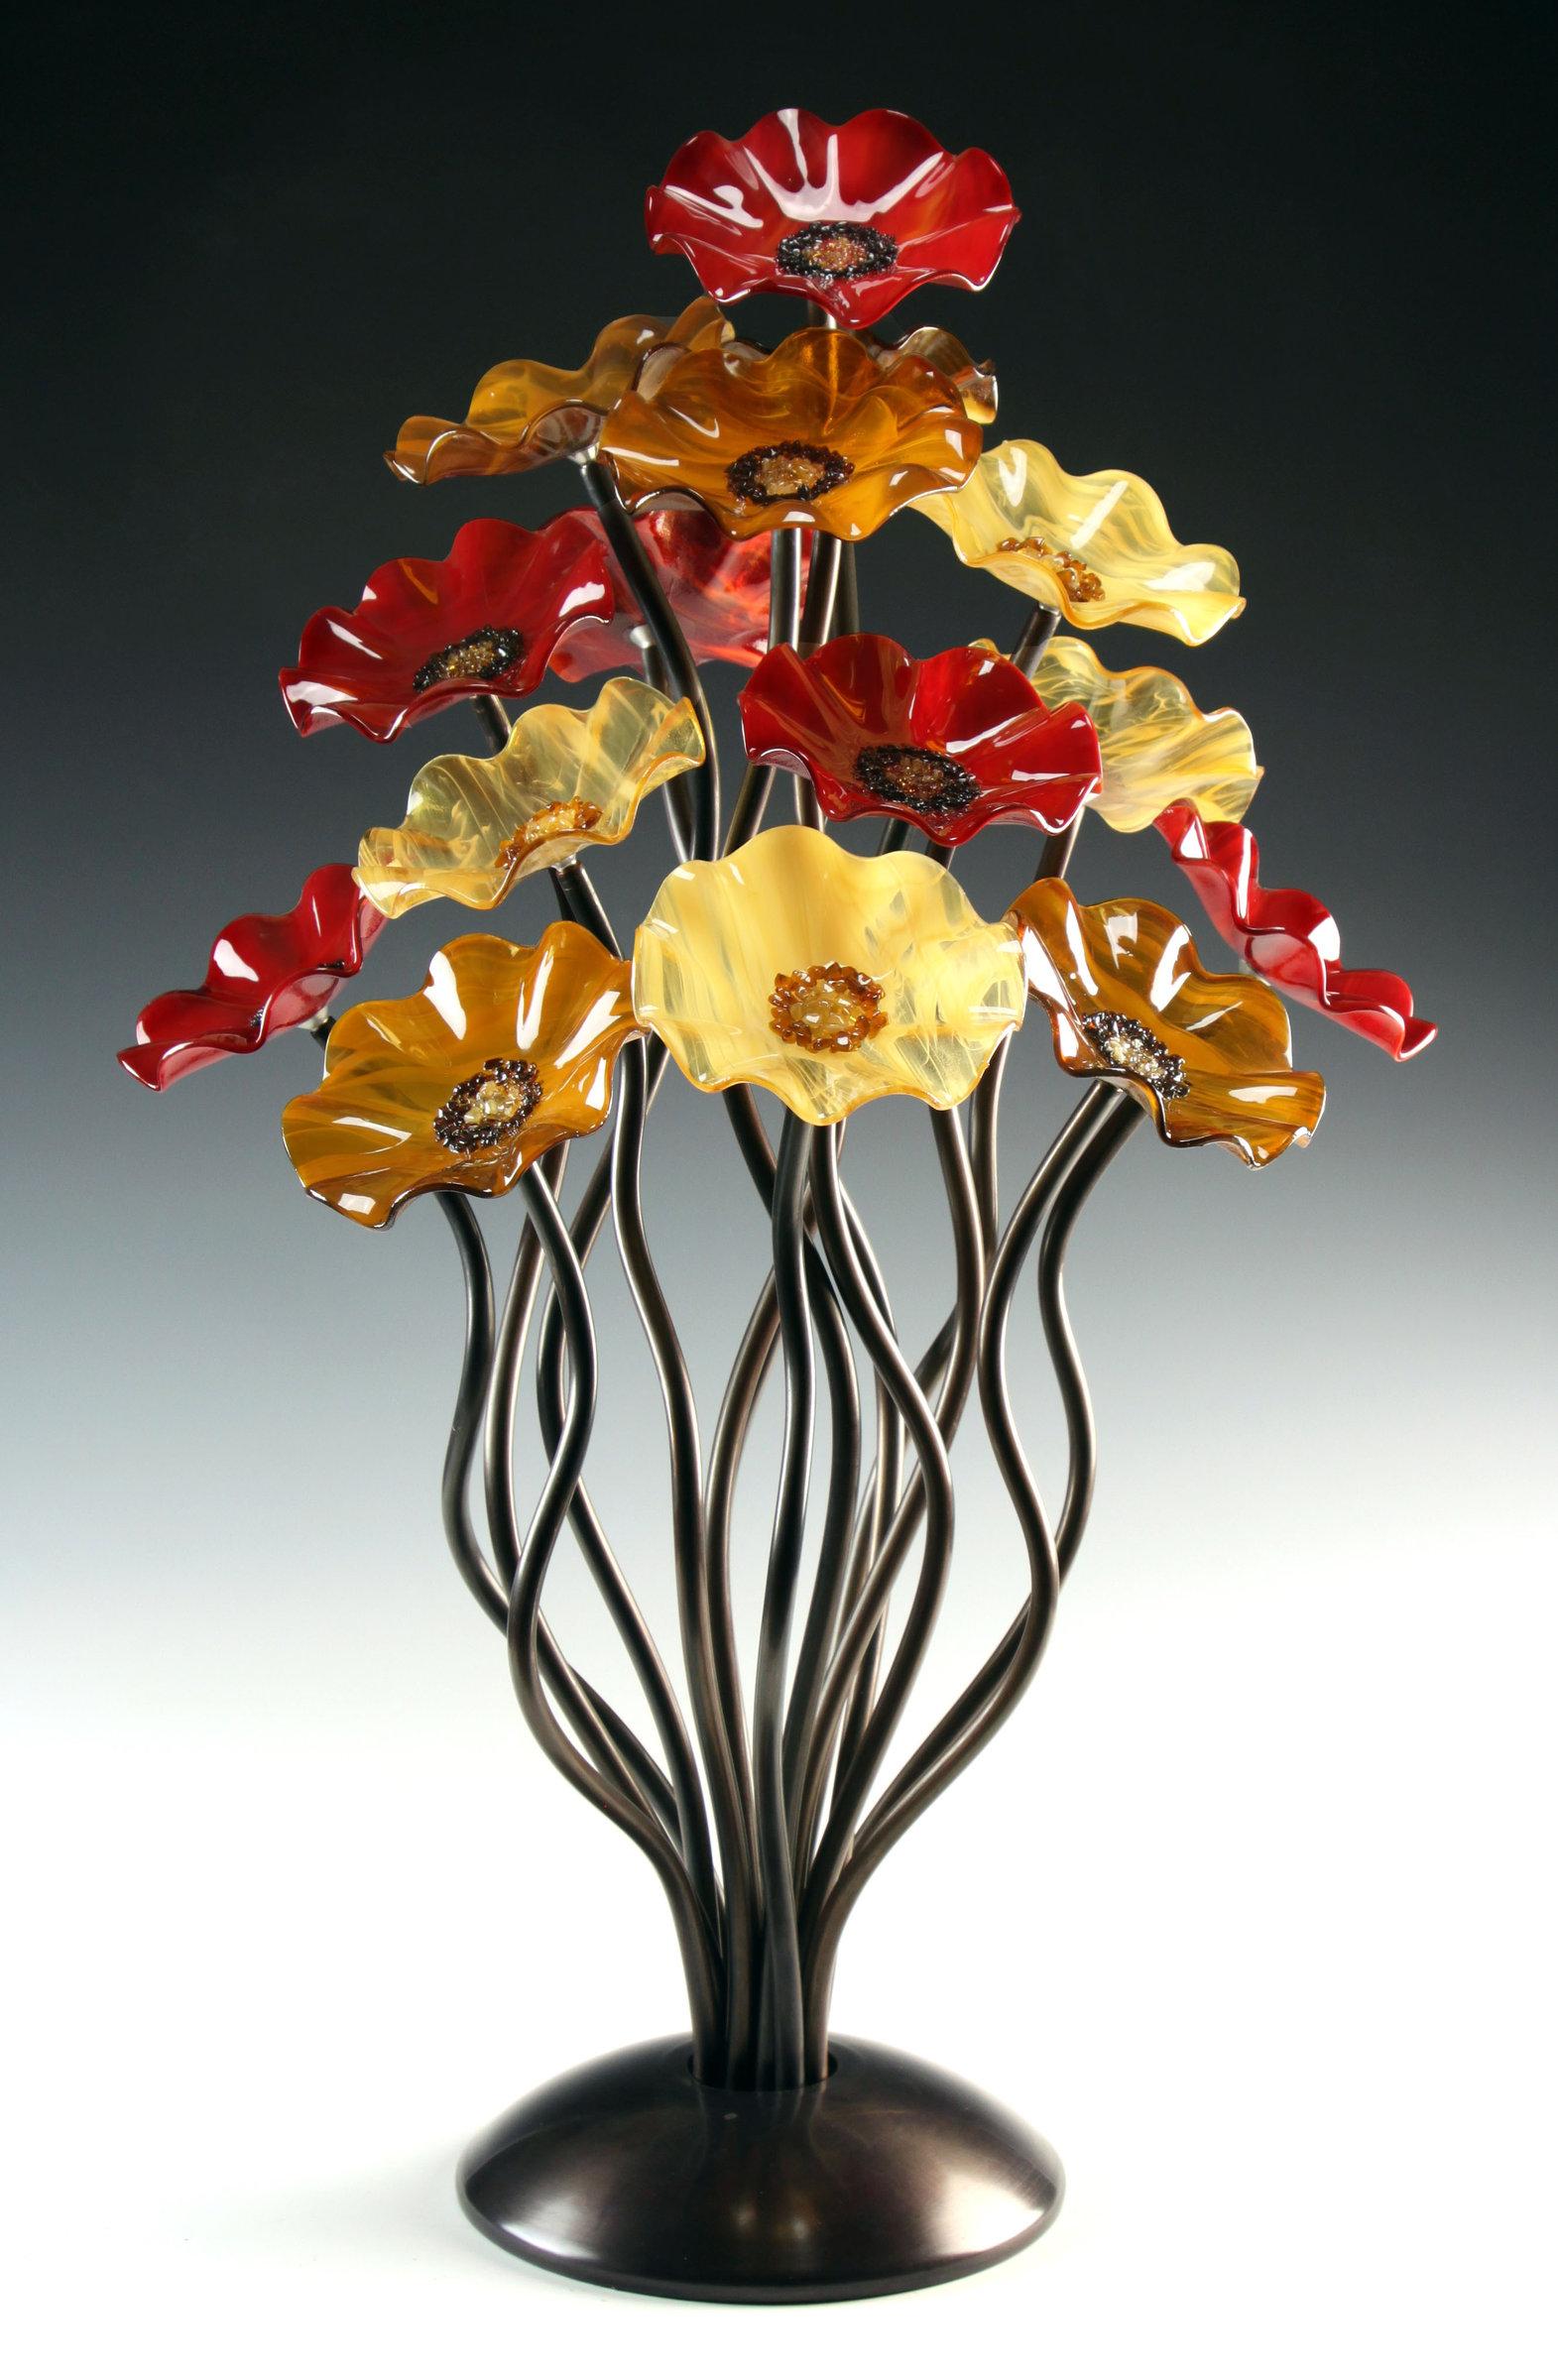 Breckenridge Tree by Scott Johnson and Shawn Johnson (Art Glass Sculpture)  | Artful Home